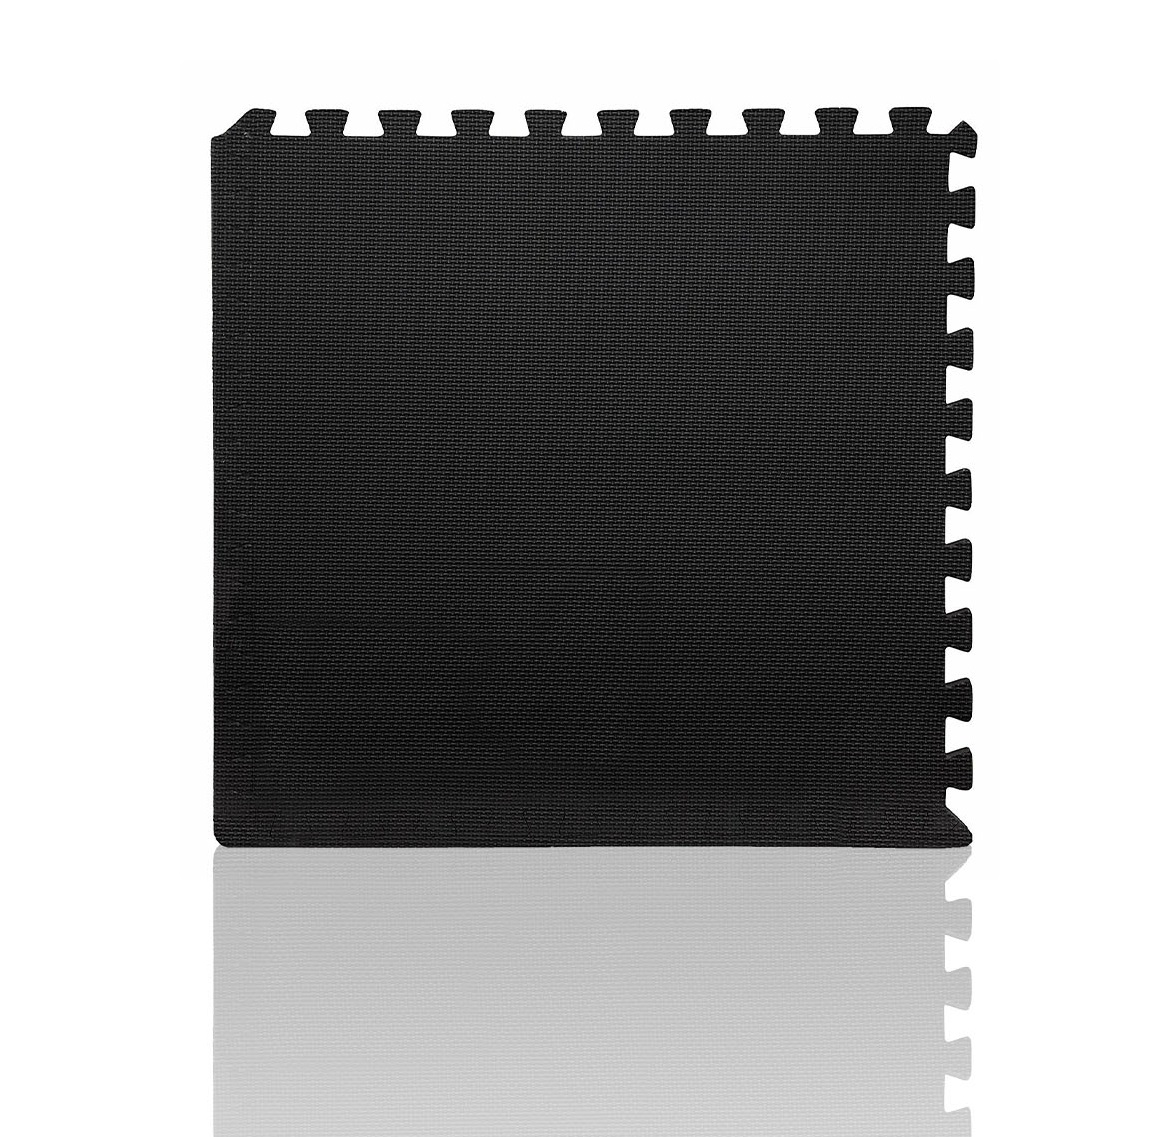 Interlocking Non-Skid Eva Foam Mats 4 Tiles (16 Square Feet)